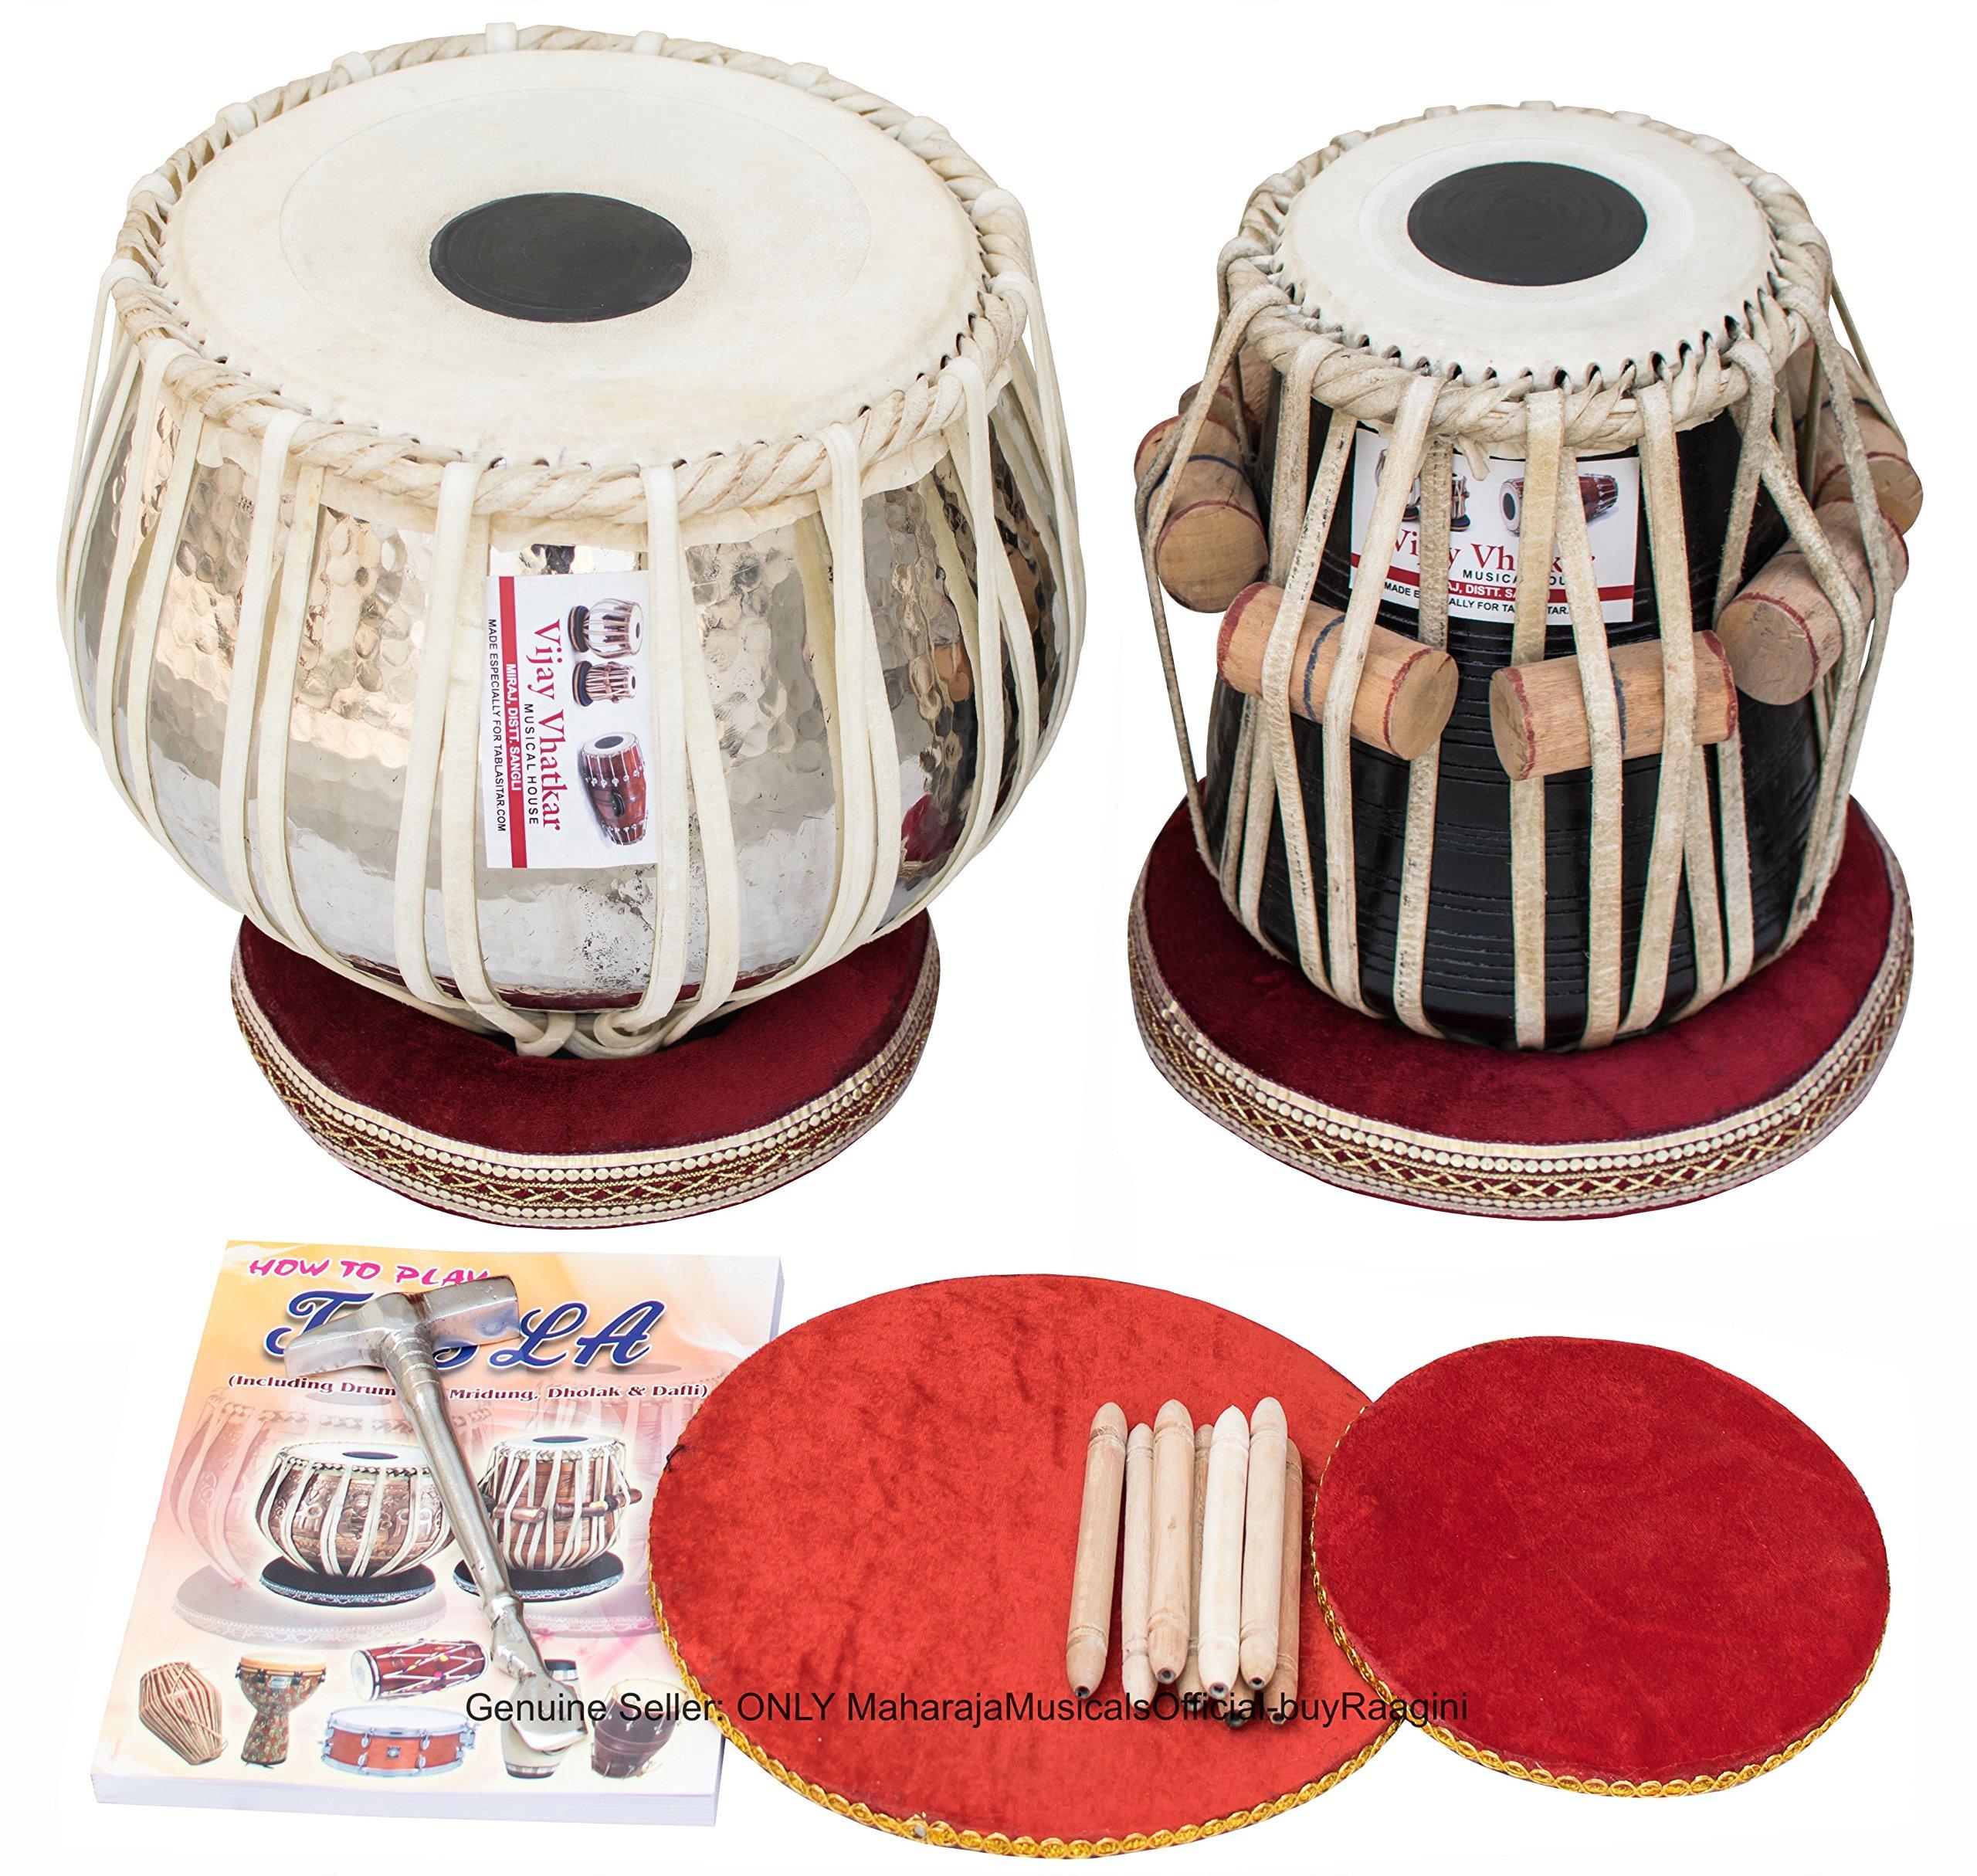 Vijay Vhatkar Tabla, Special Concert, 4KG Chromed Copper Bayan, Finest Sheesham Dayan, Tabla Drums, Book, Hammer, Cushions, Cover, Tabla Instrument Indian (PDI-BBD)